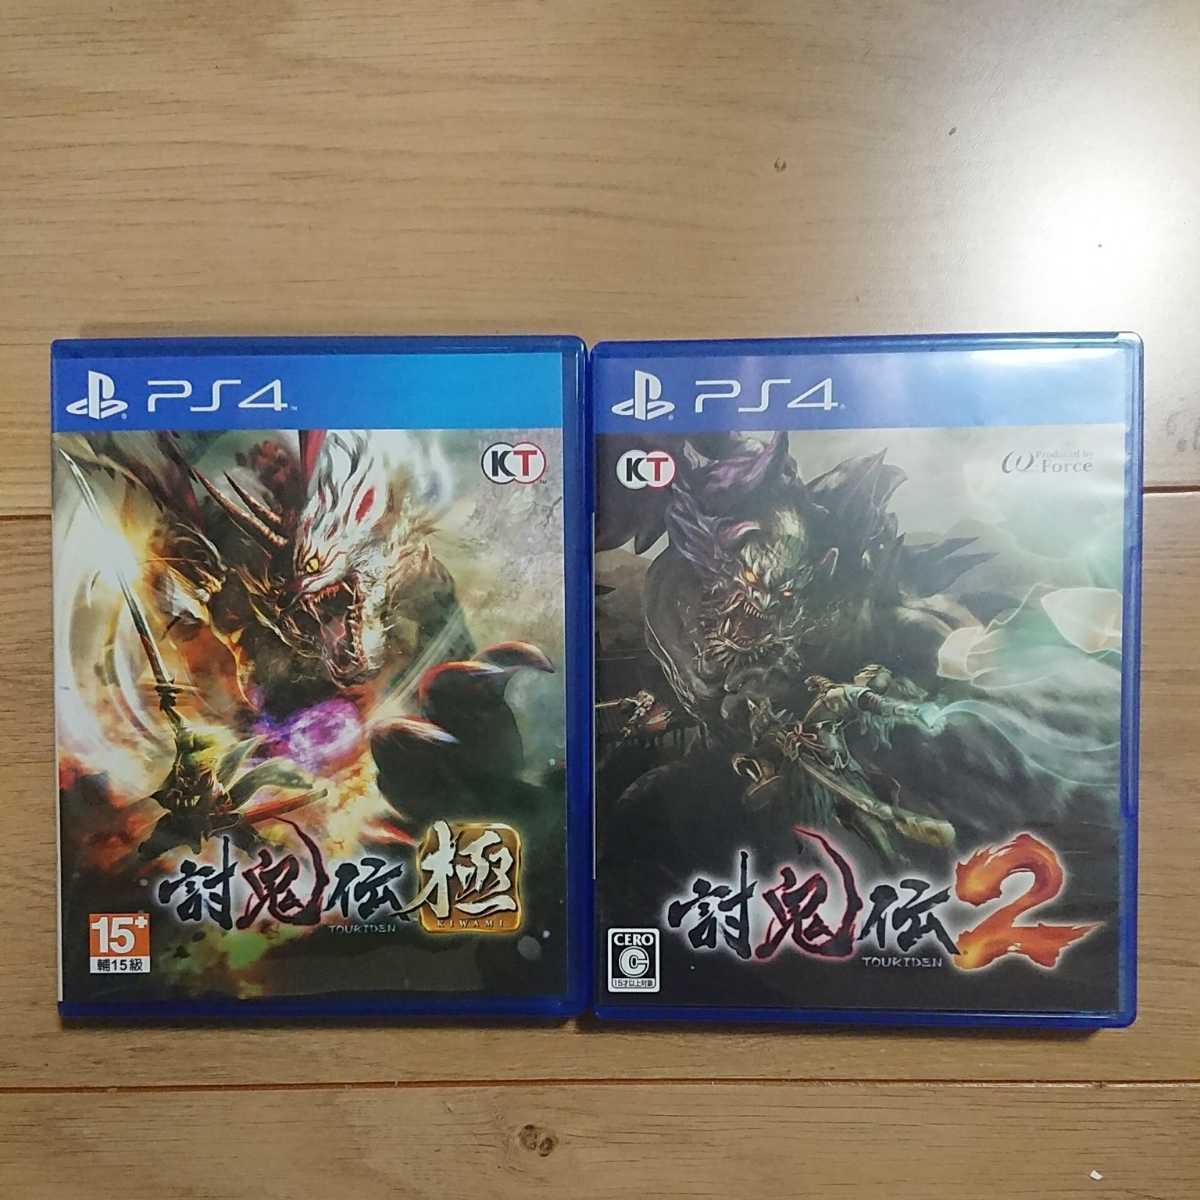 PS4 討鬼伝 極 討鬼伝2 セット